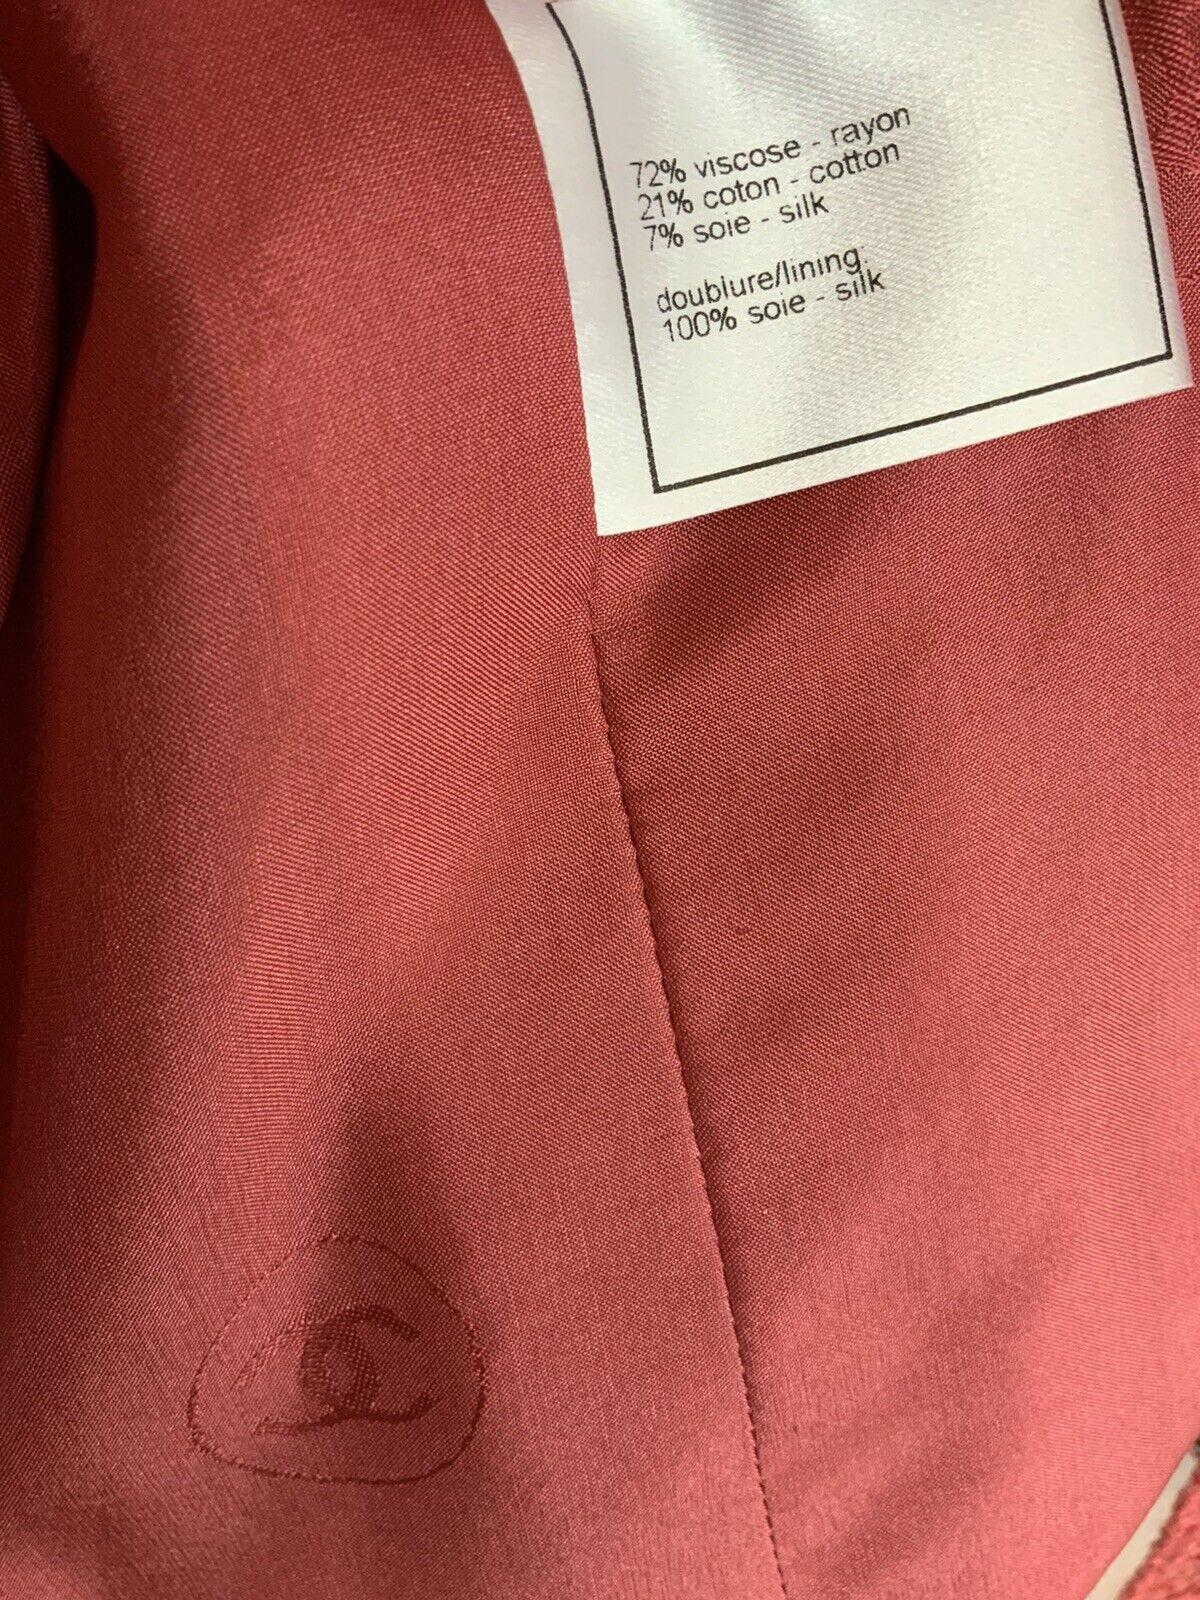 Authentic Chanel jacket - image 9